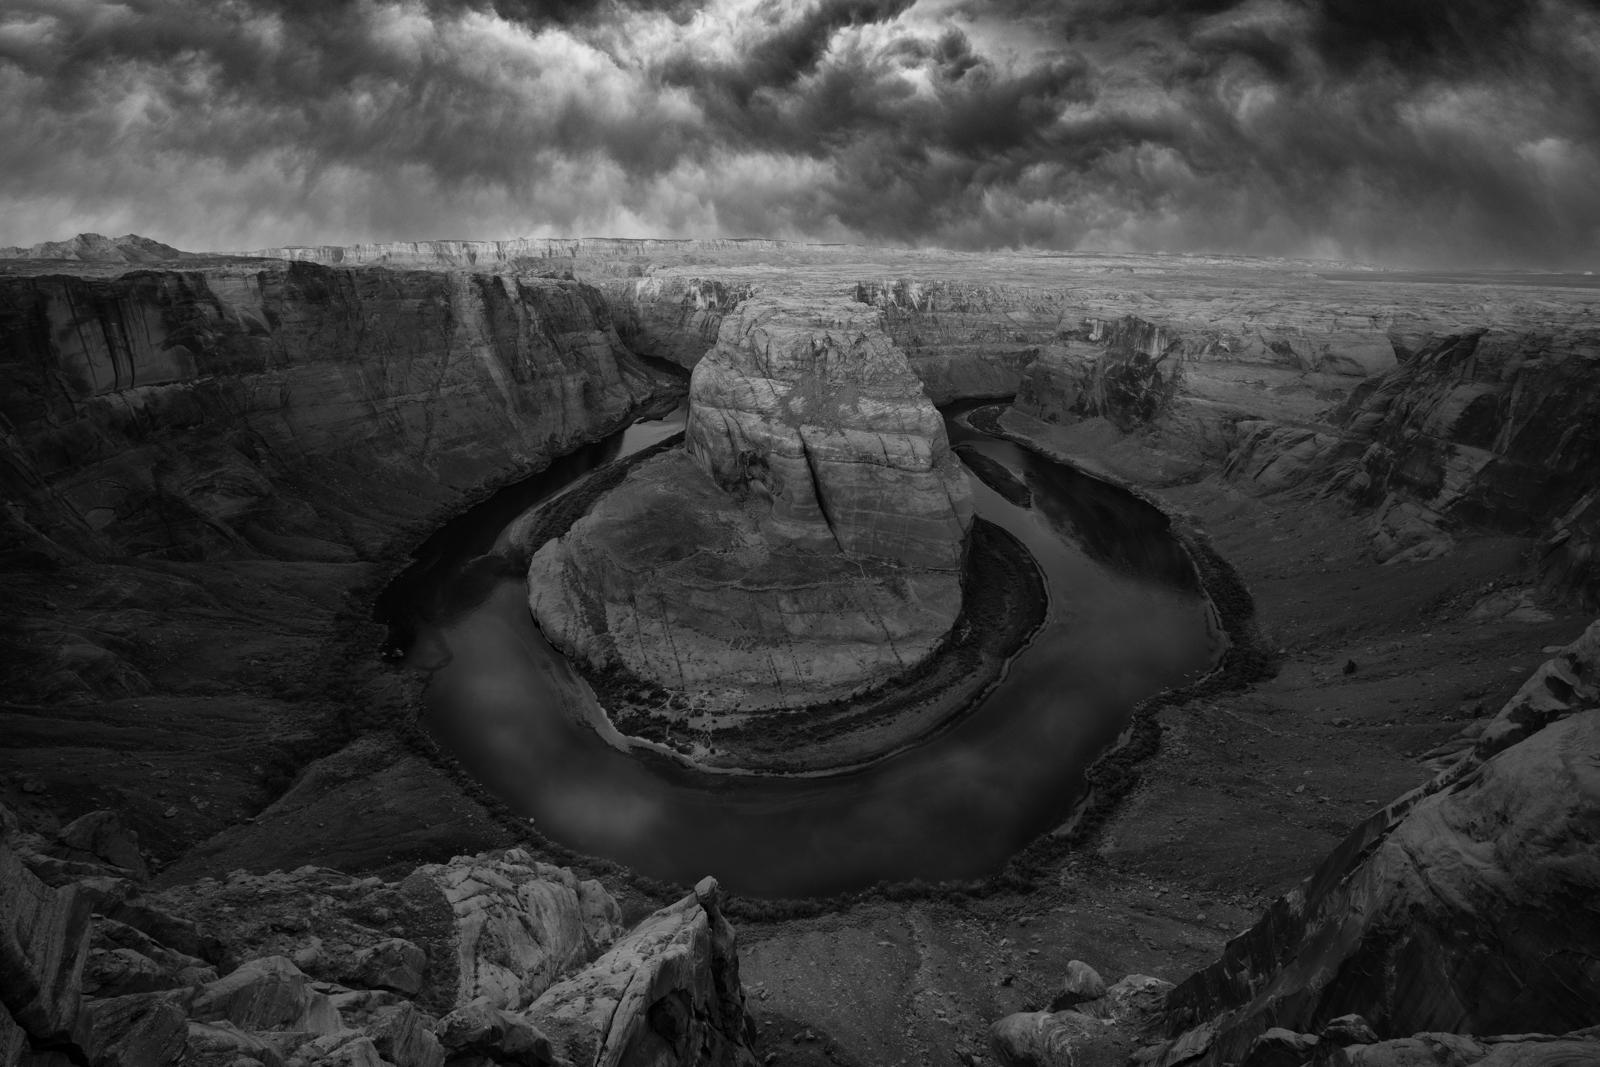 Summer storm brewing over Horseshoe Bend, Arizona.